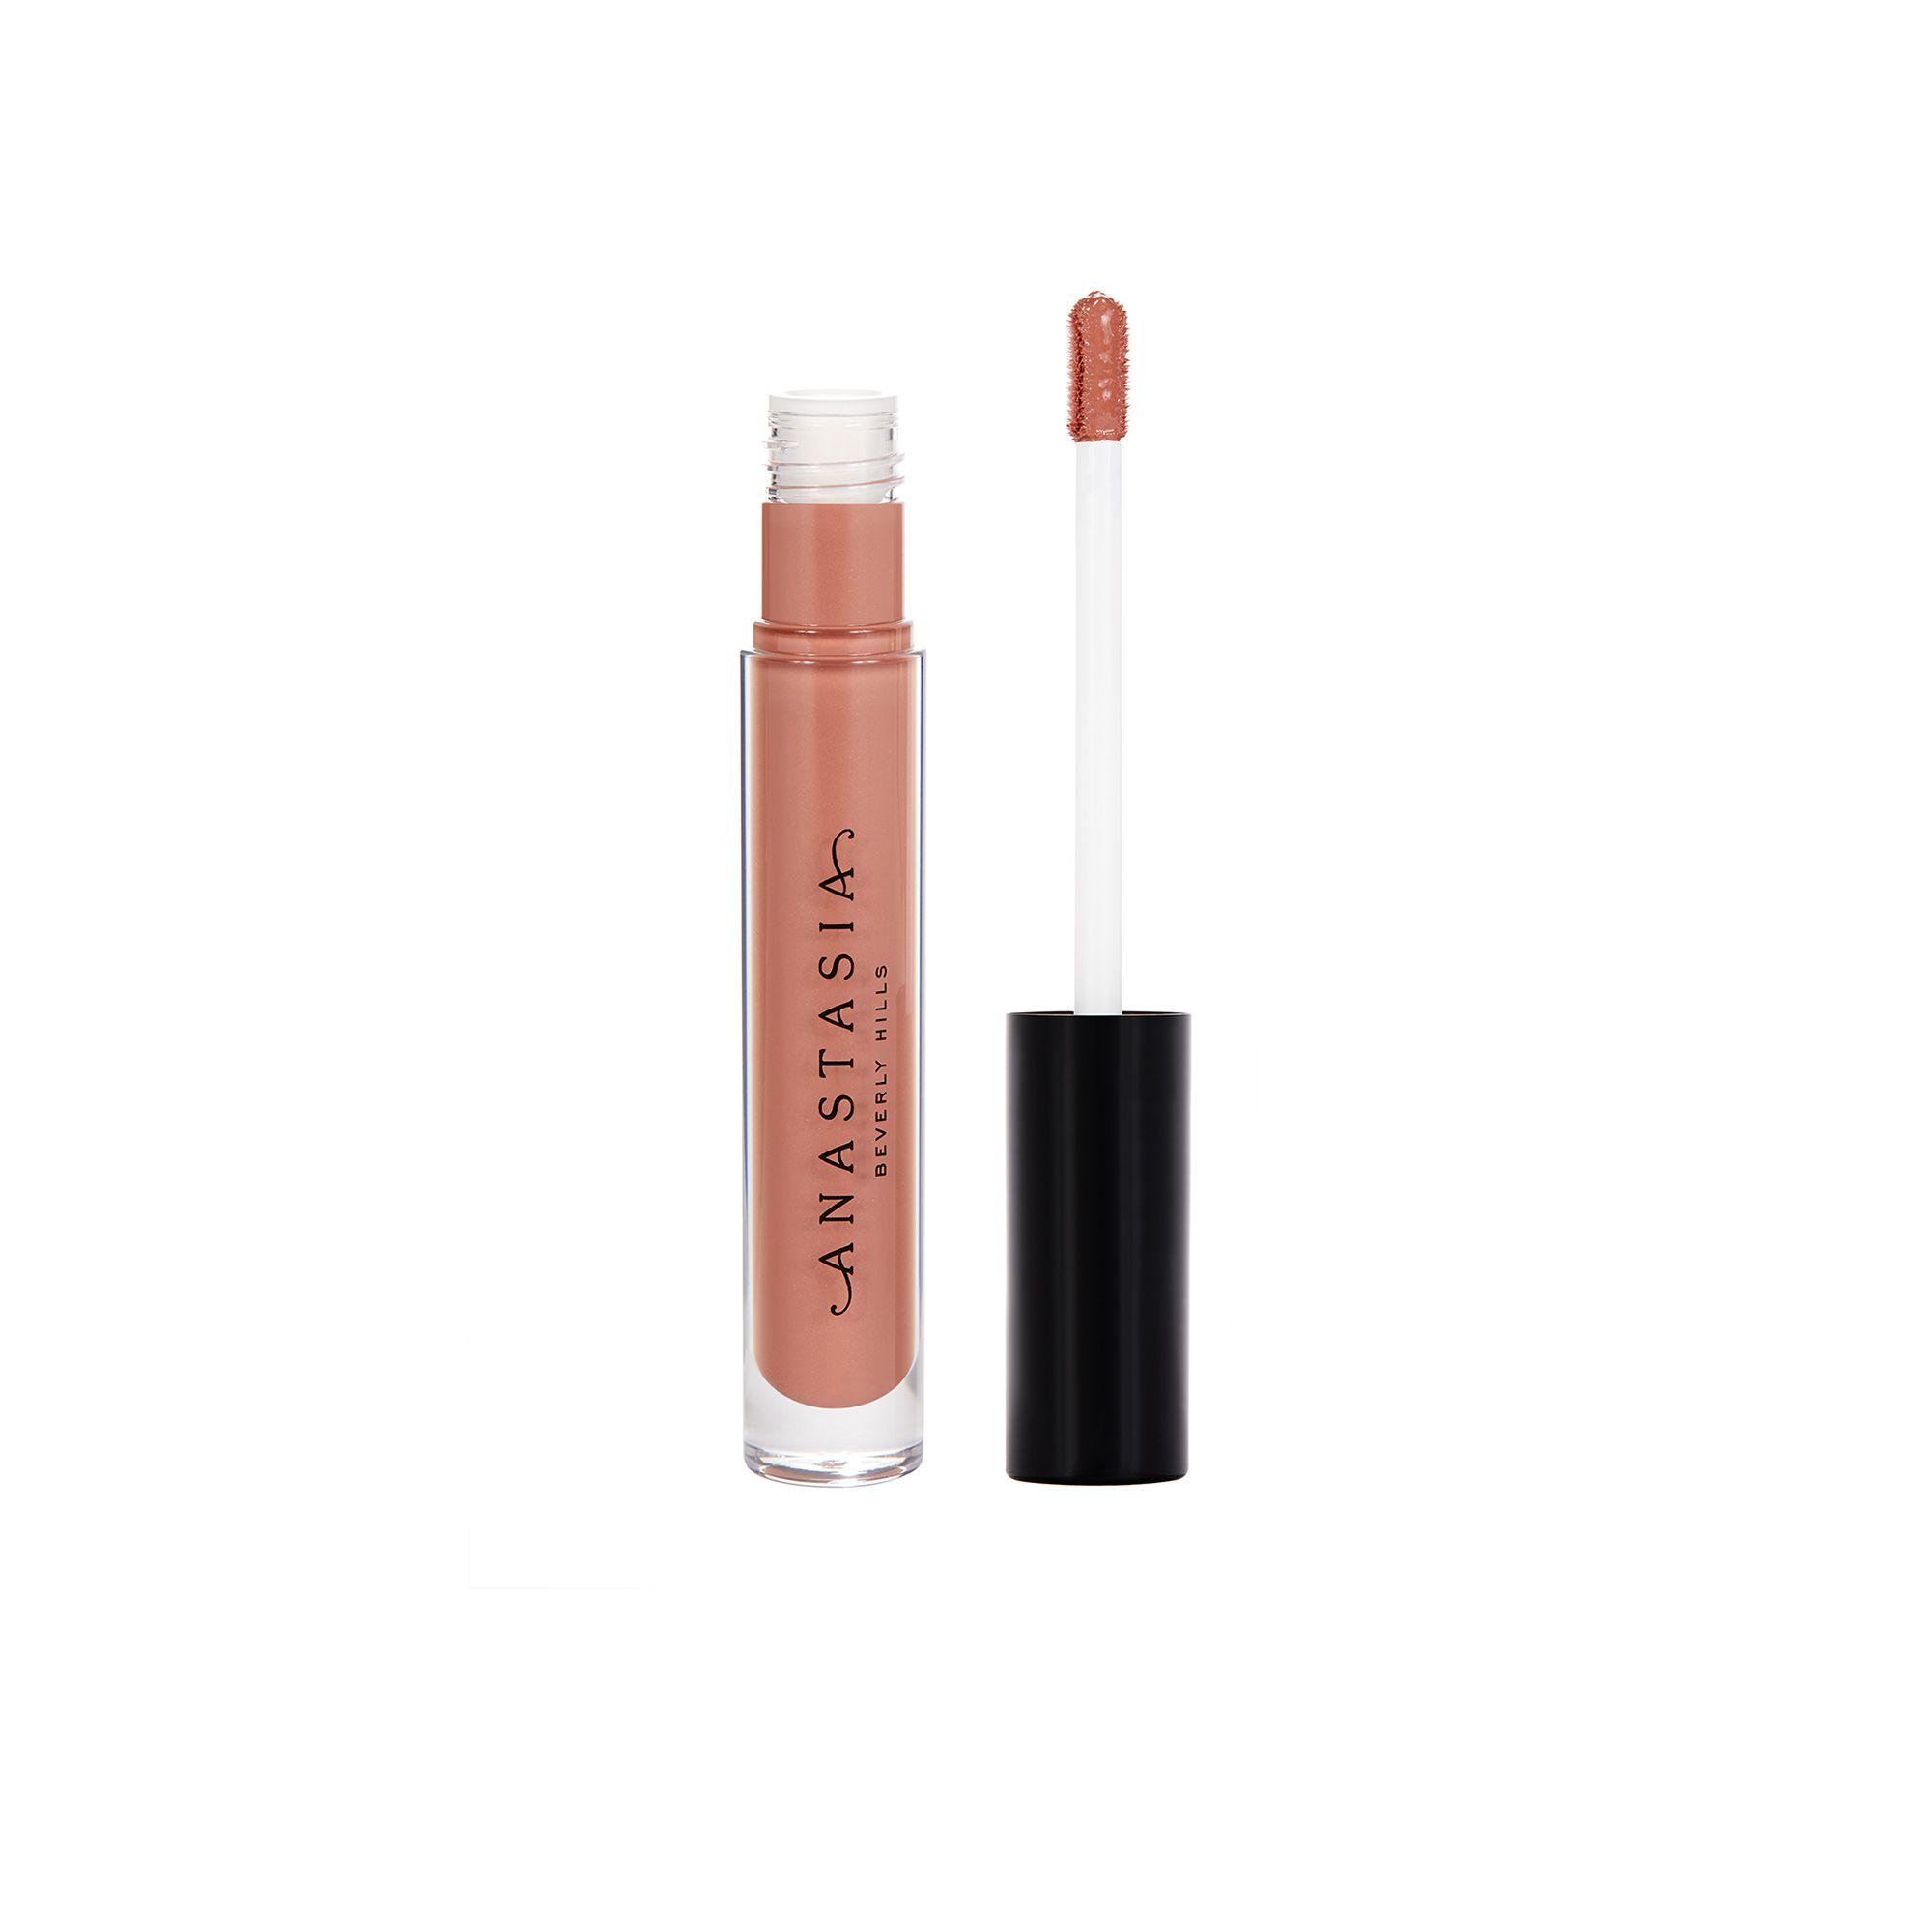 High Shine Lip Gloss | Lip Glosses | Lip gloss, Lips, Purple lips